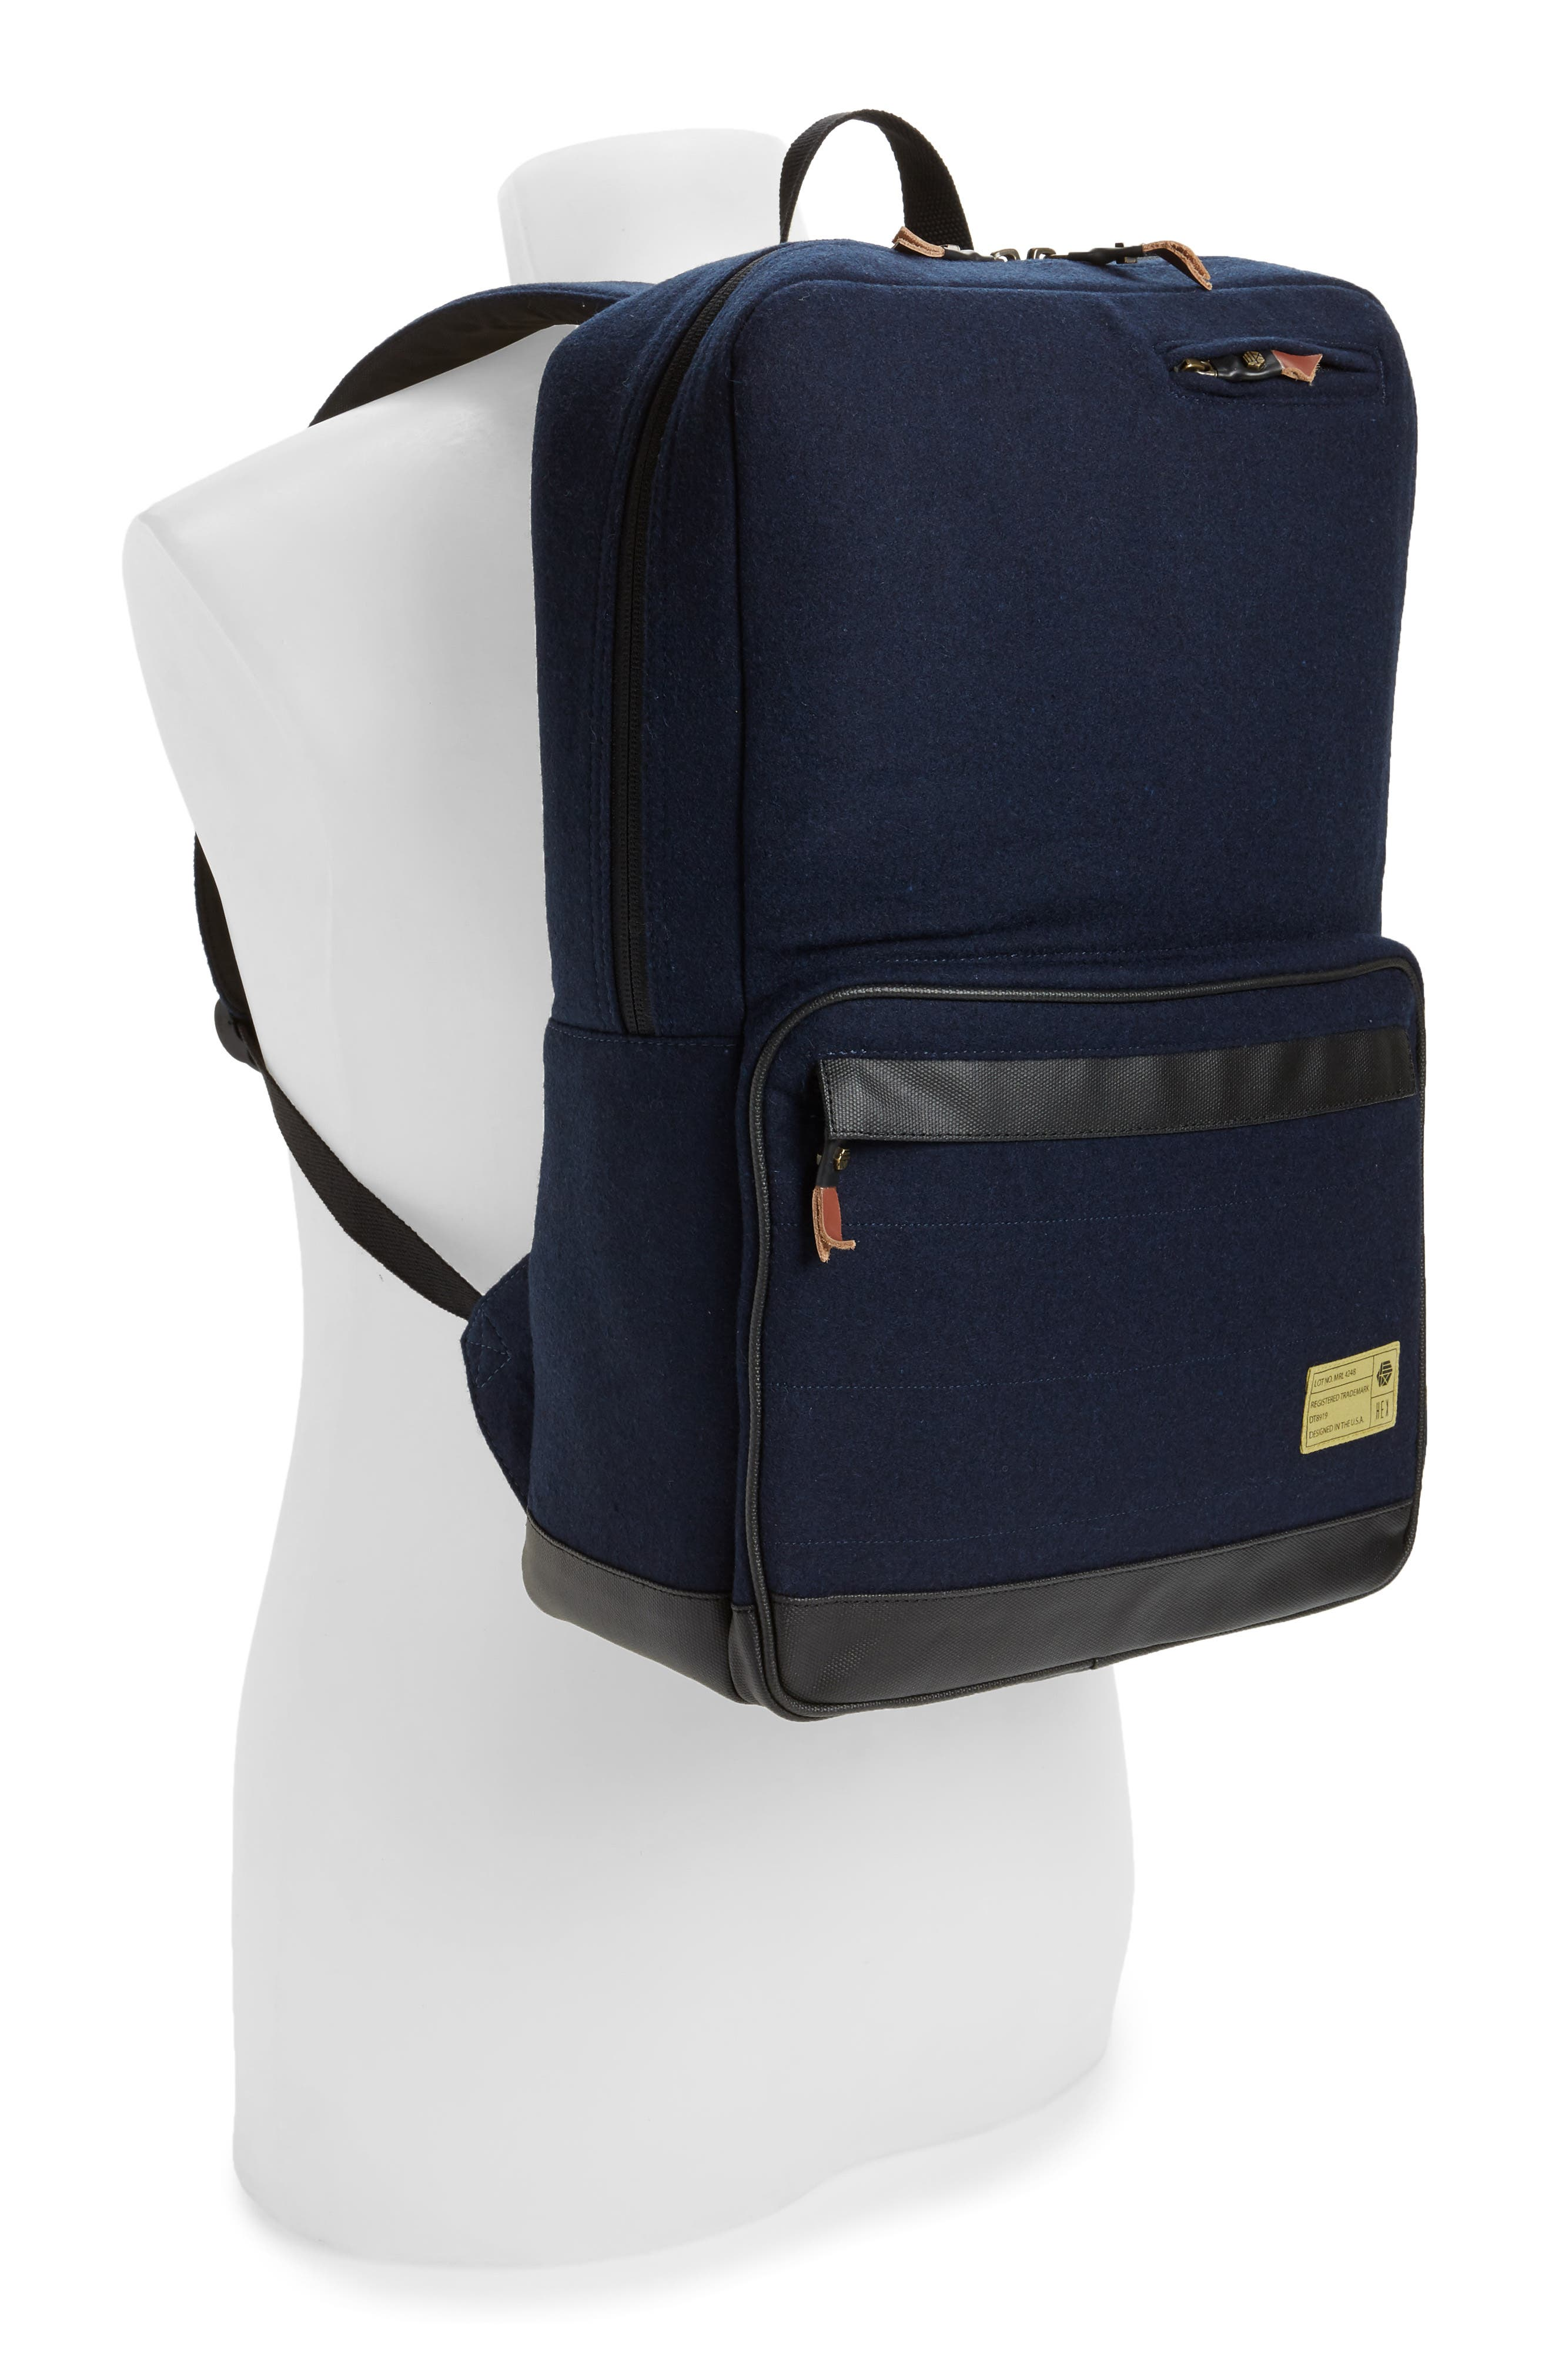 Radar Origin Water Resistant Commuter/Travel Laptop Backpack,                             Alternate thumbnail 2, color,                             410